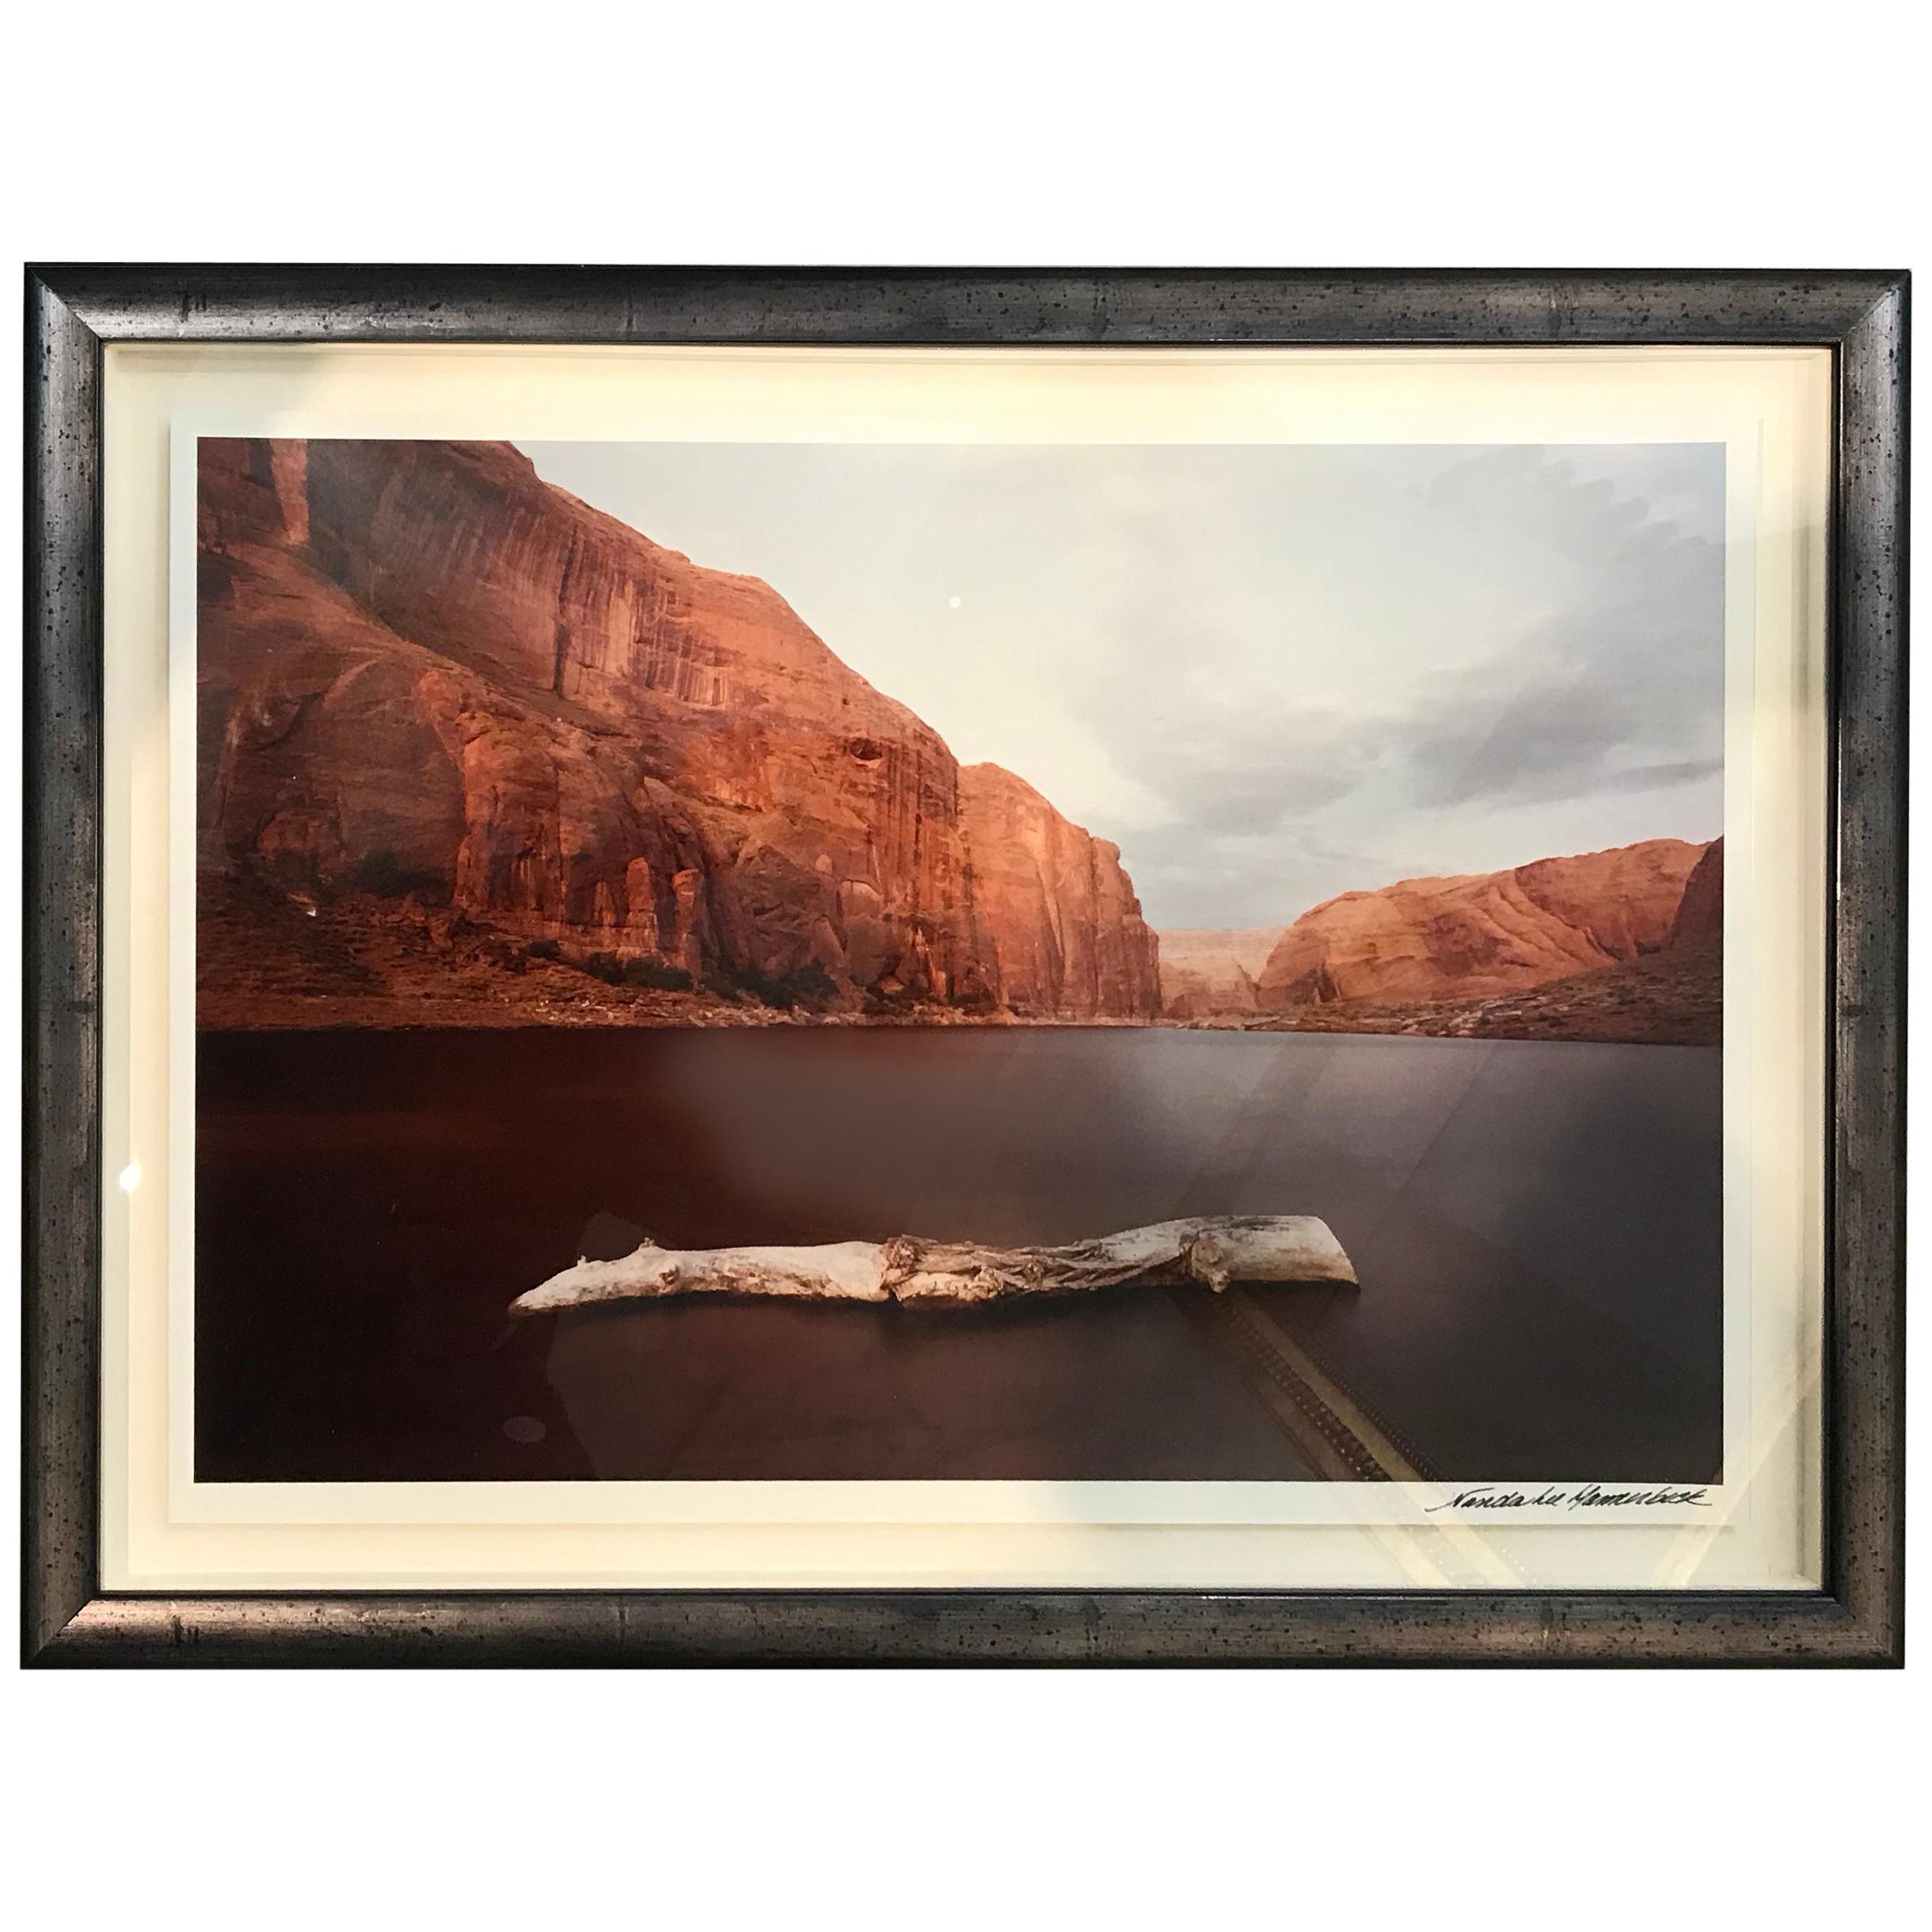 Silver Gelatin Photograph of Red Cliffs